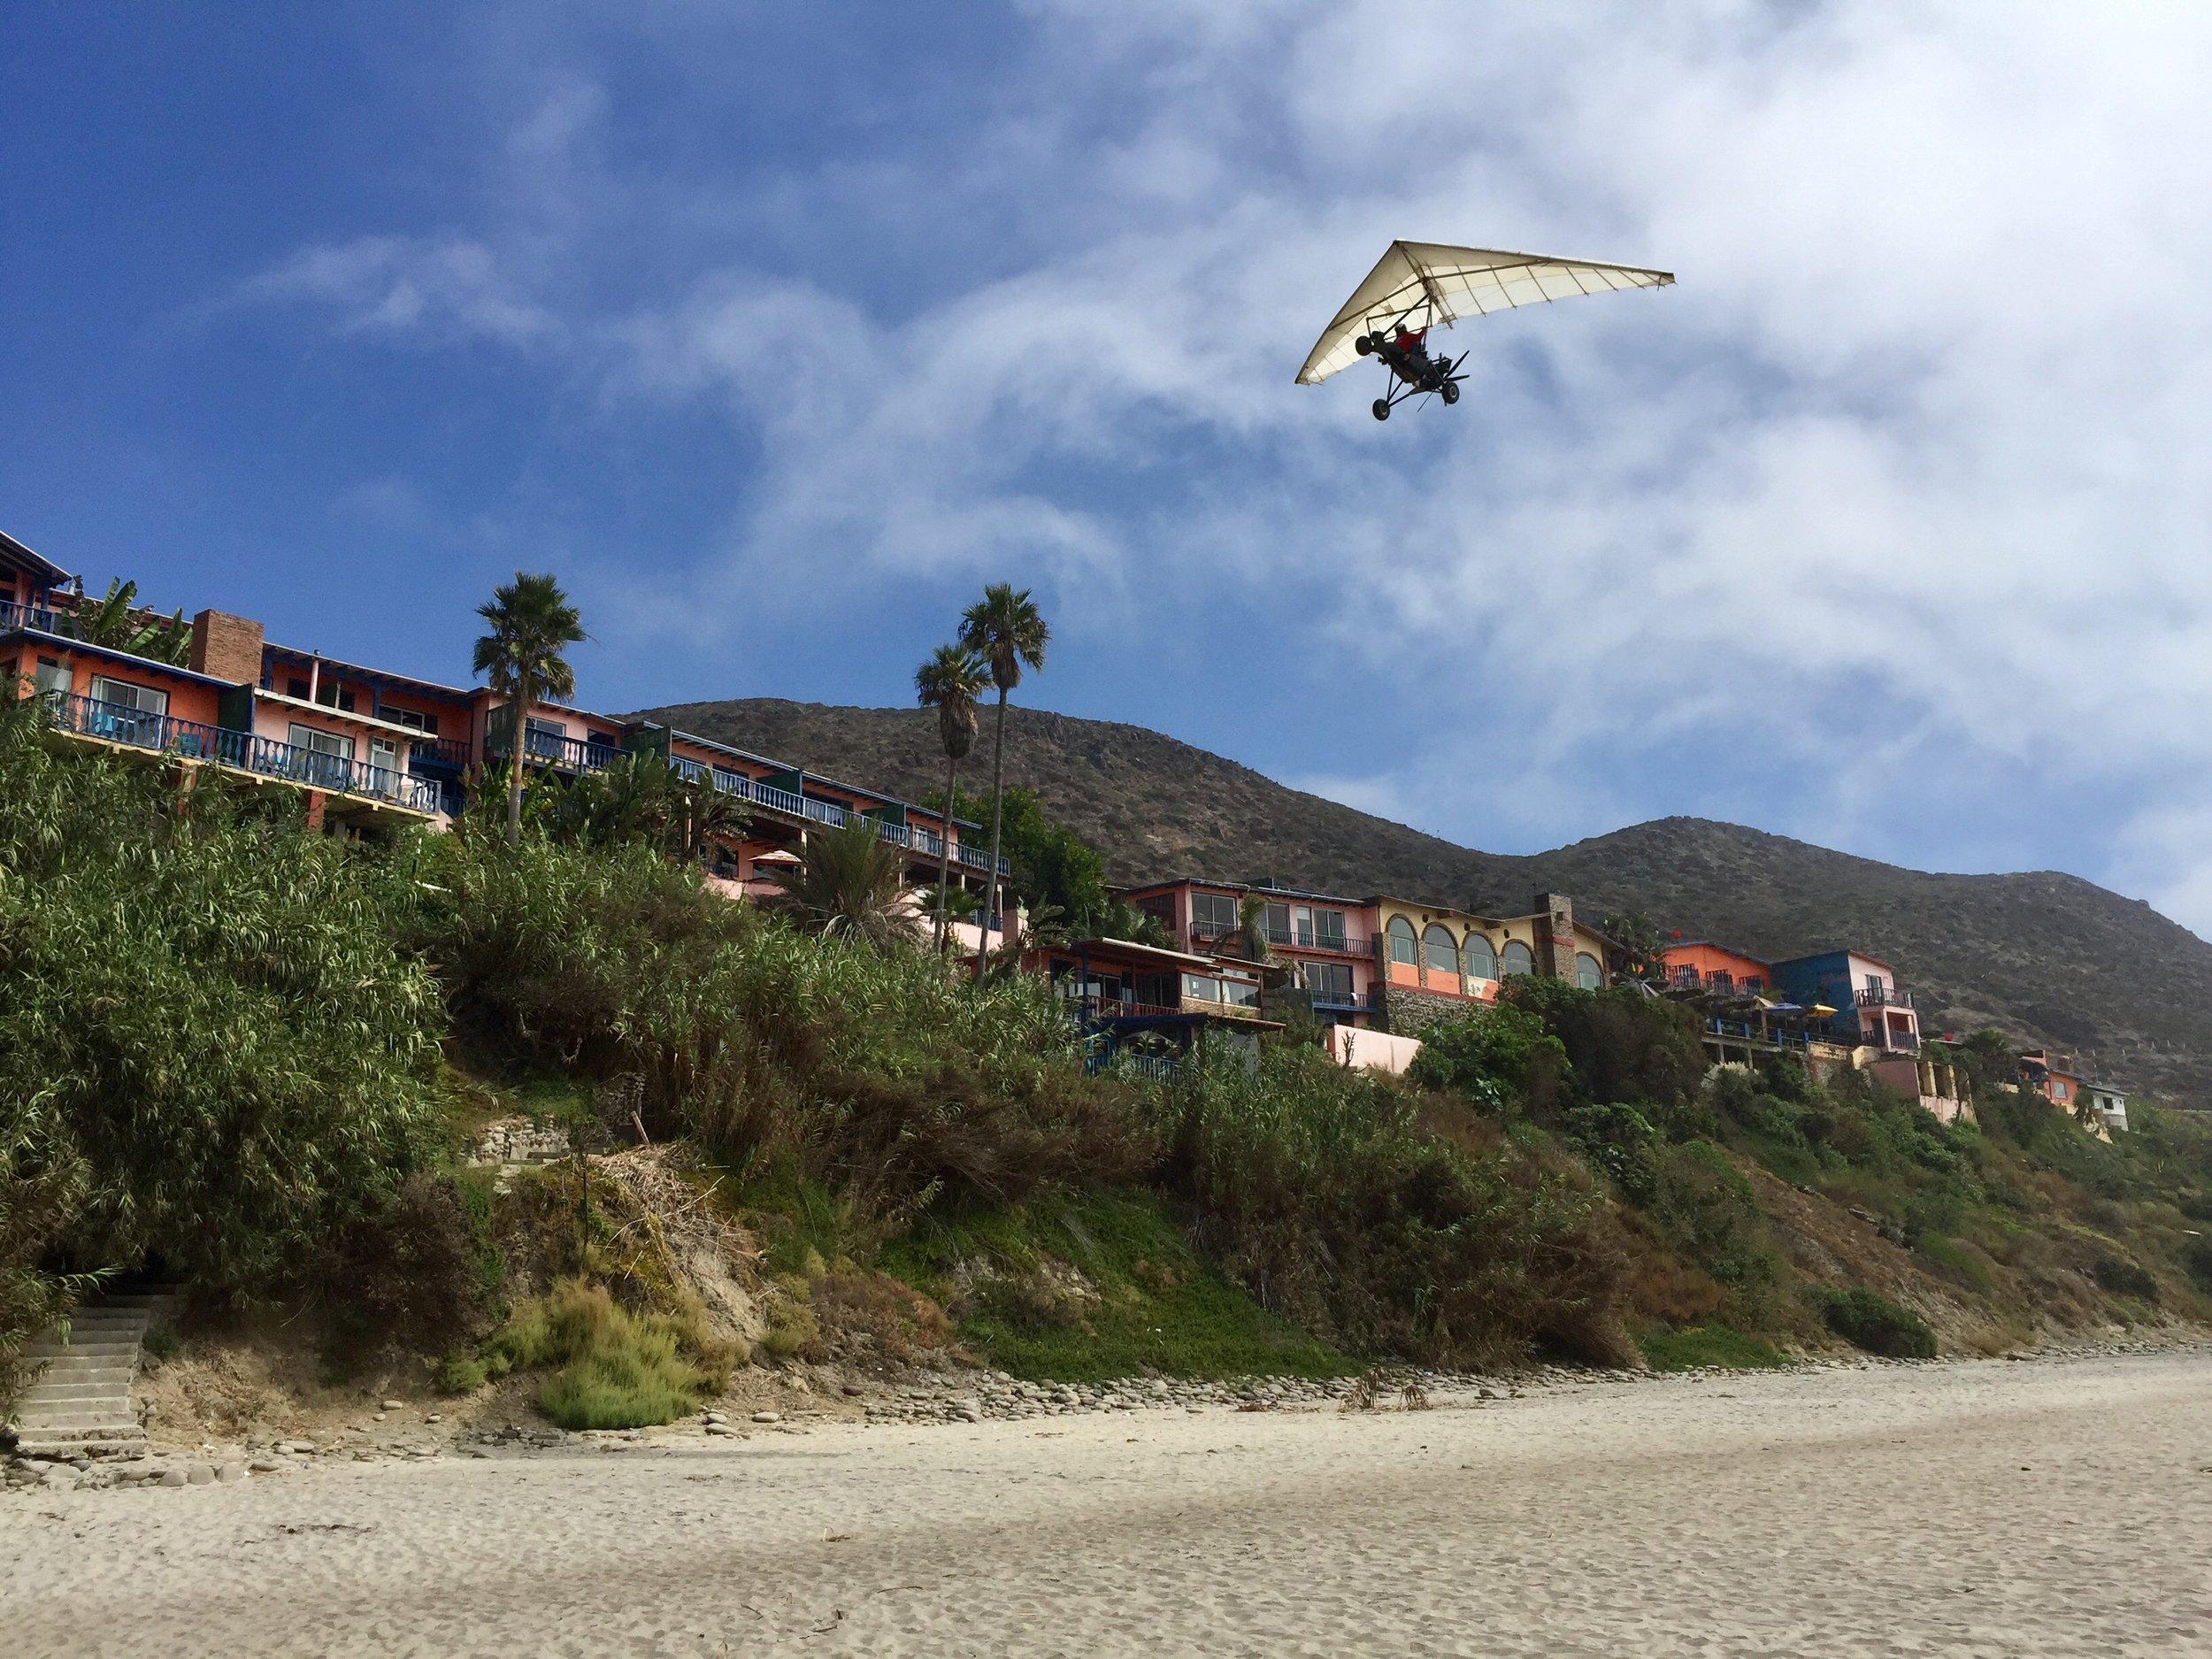 Up, up, and away over La Fonda